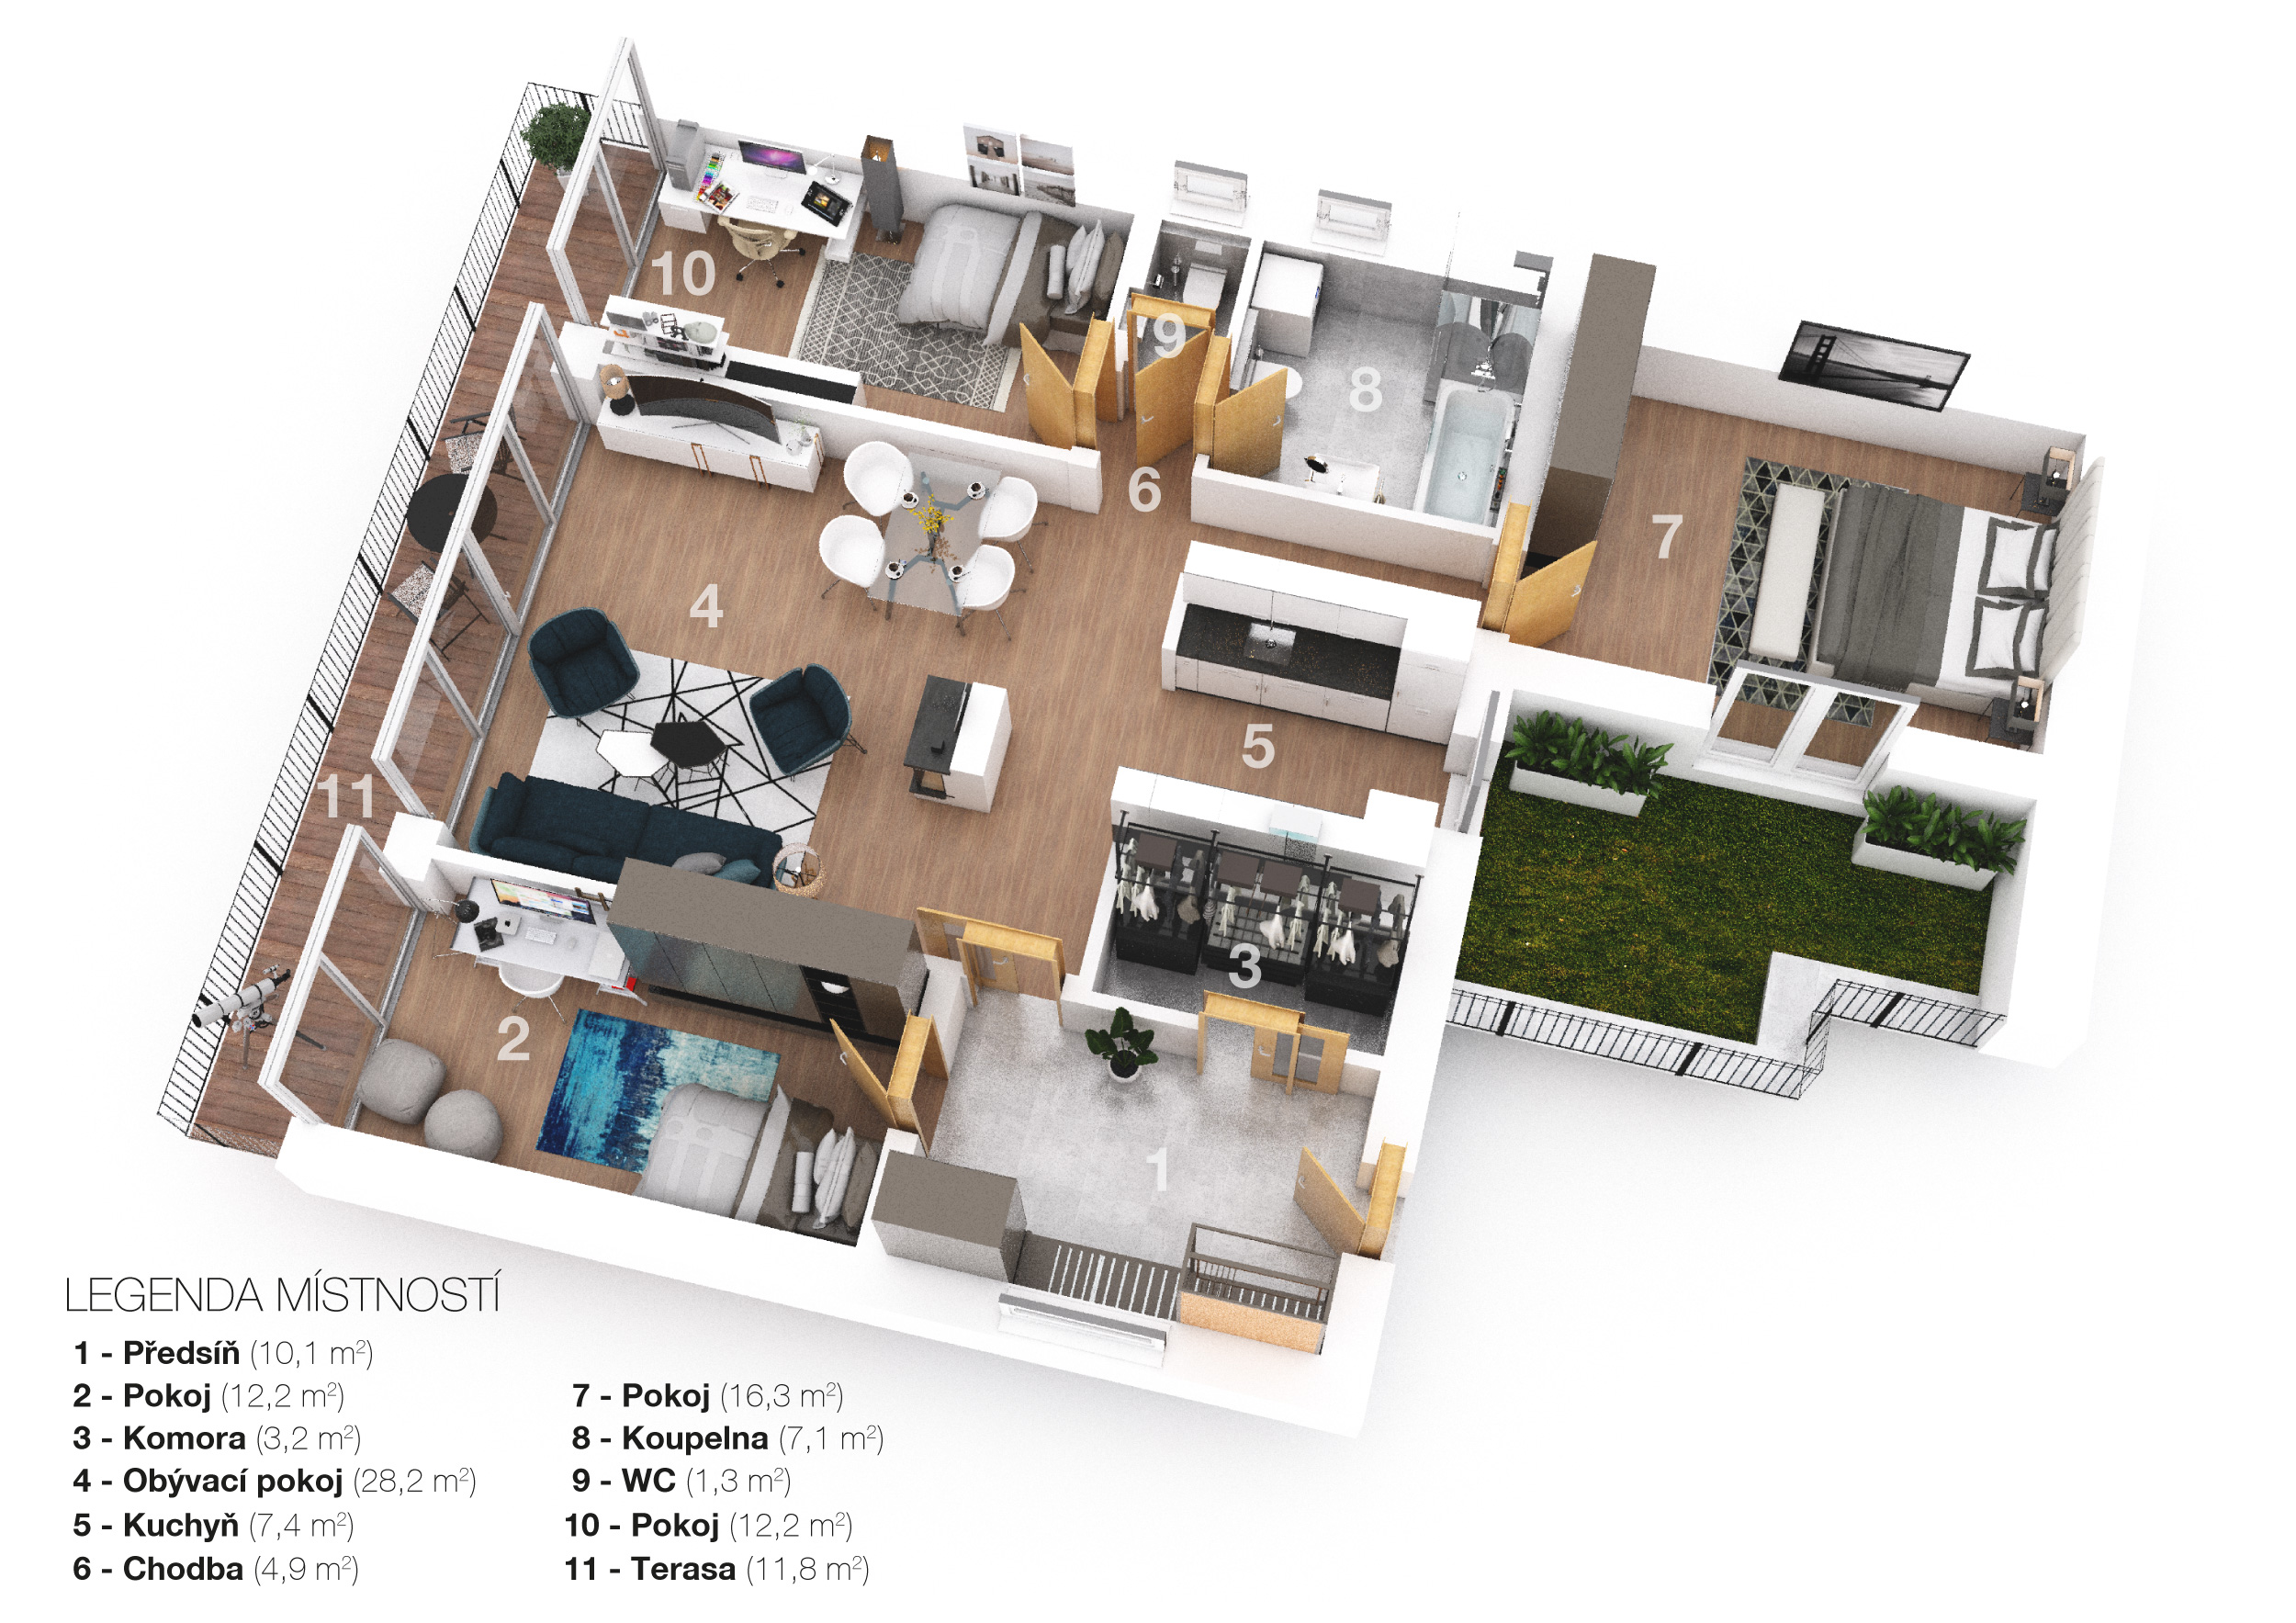 https://viladumrepublika.cz/wp-content/uploads/2021/05/3D-layout-B1.jpg